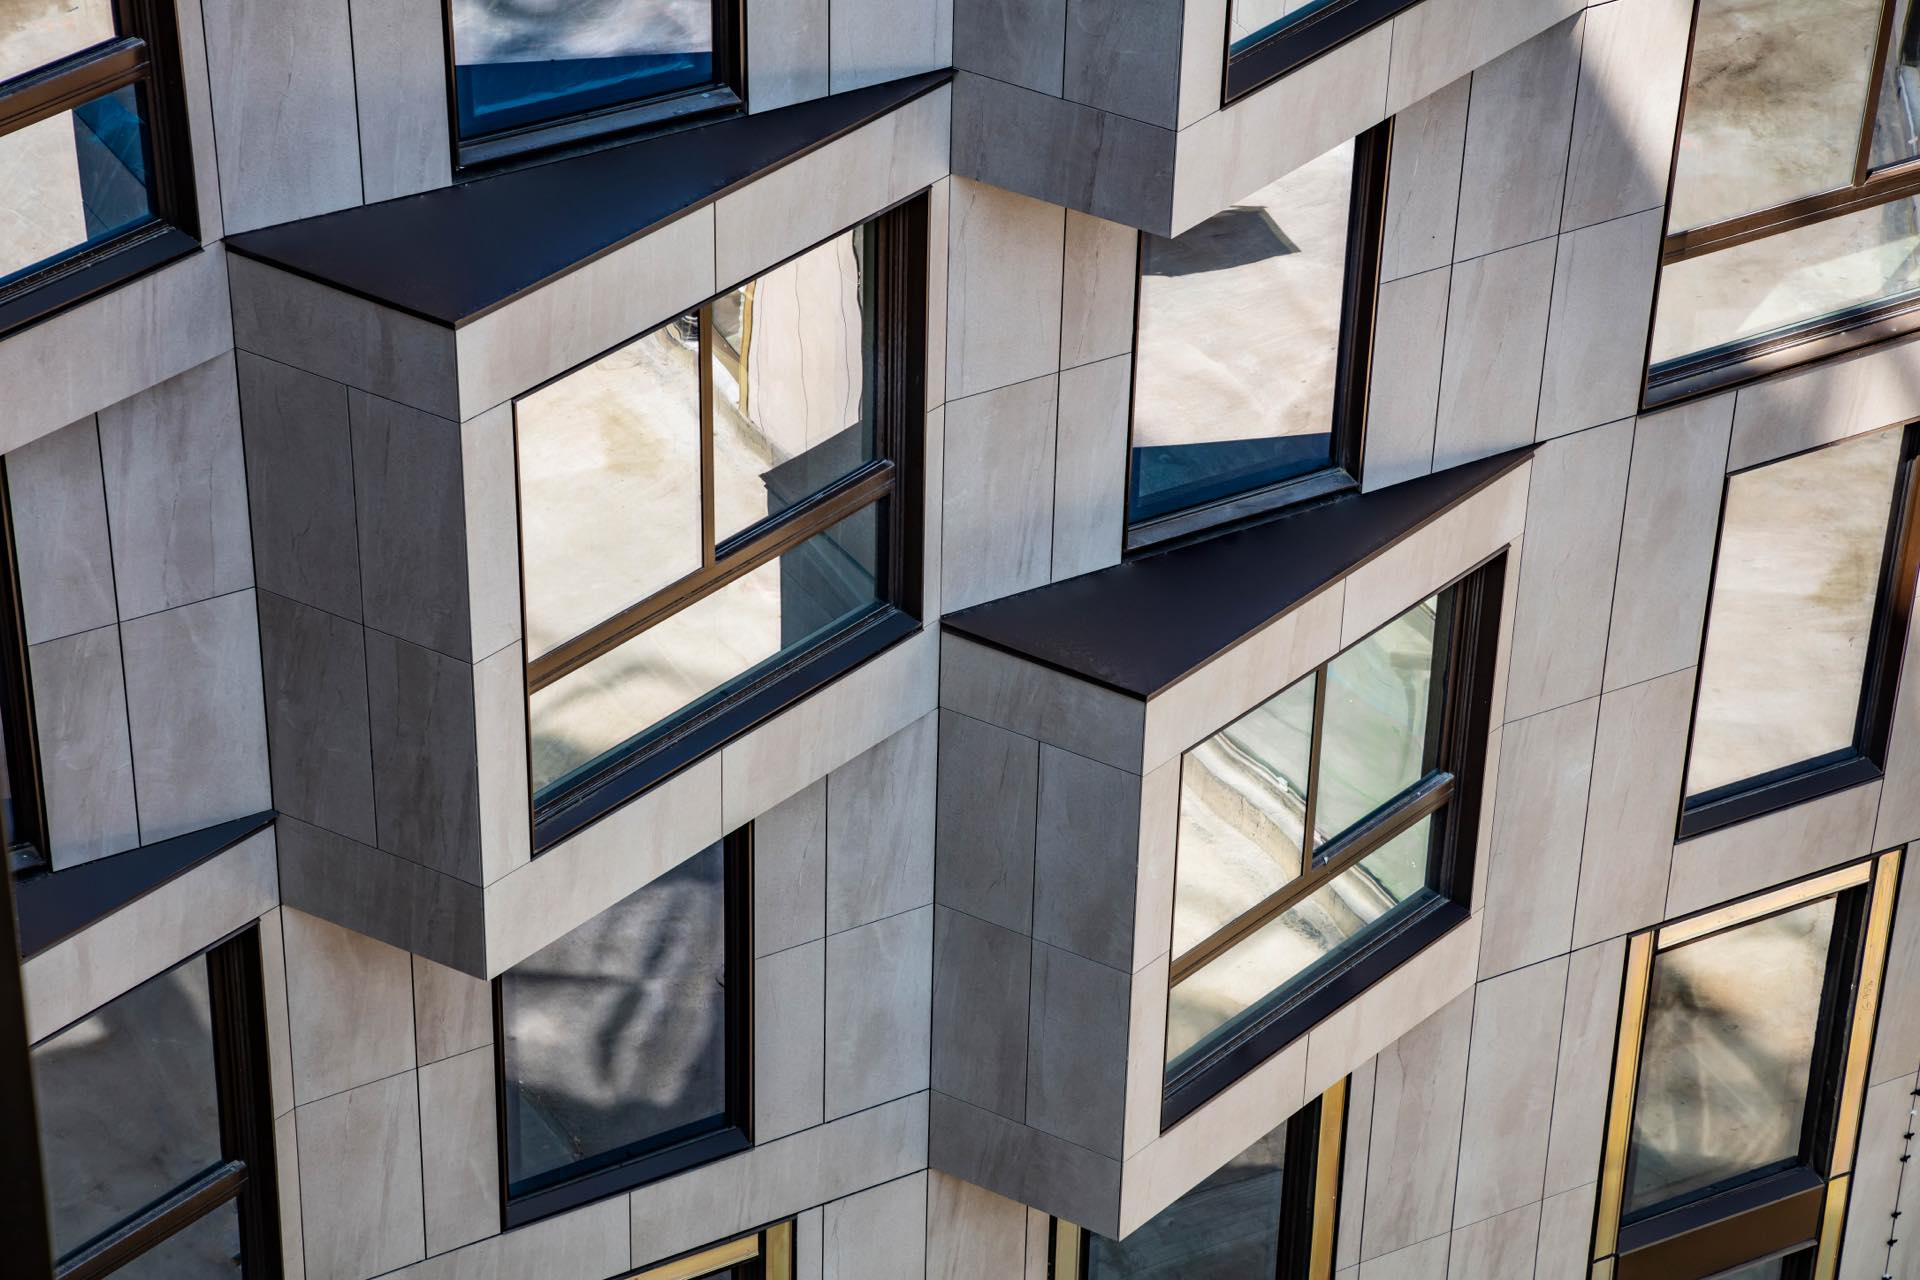 A unique, rhythmic window placement defines the Silva's facade